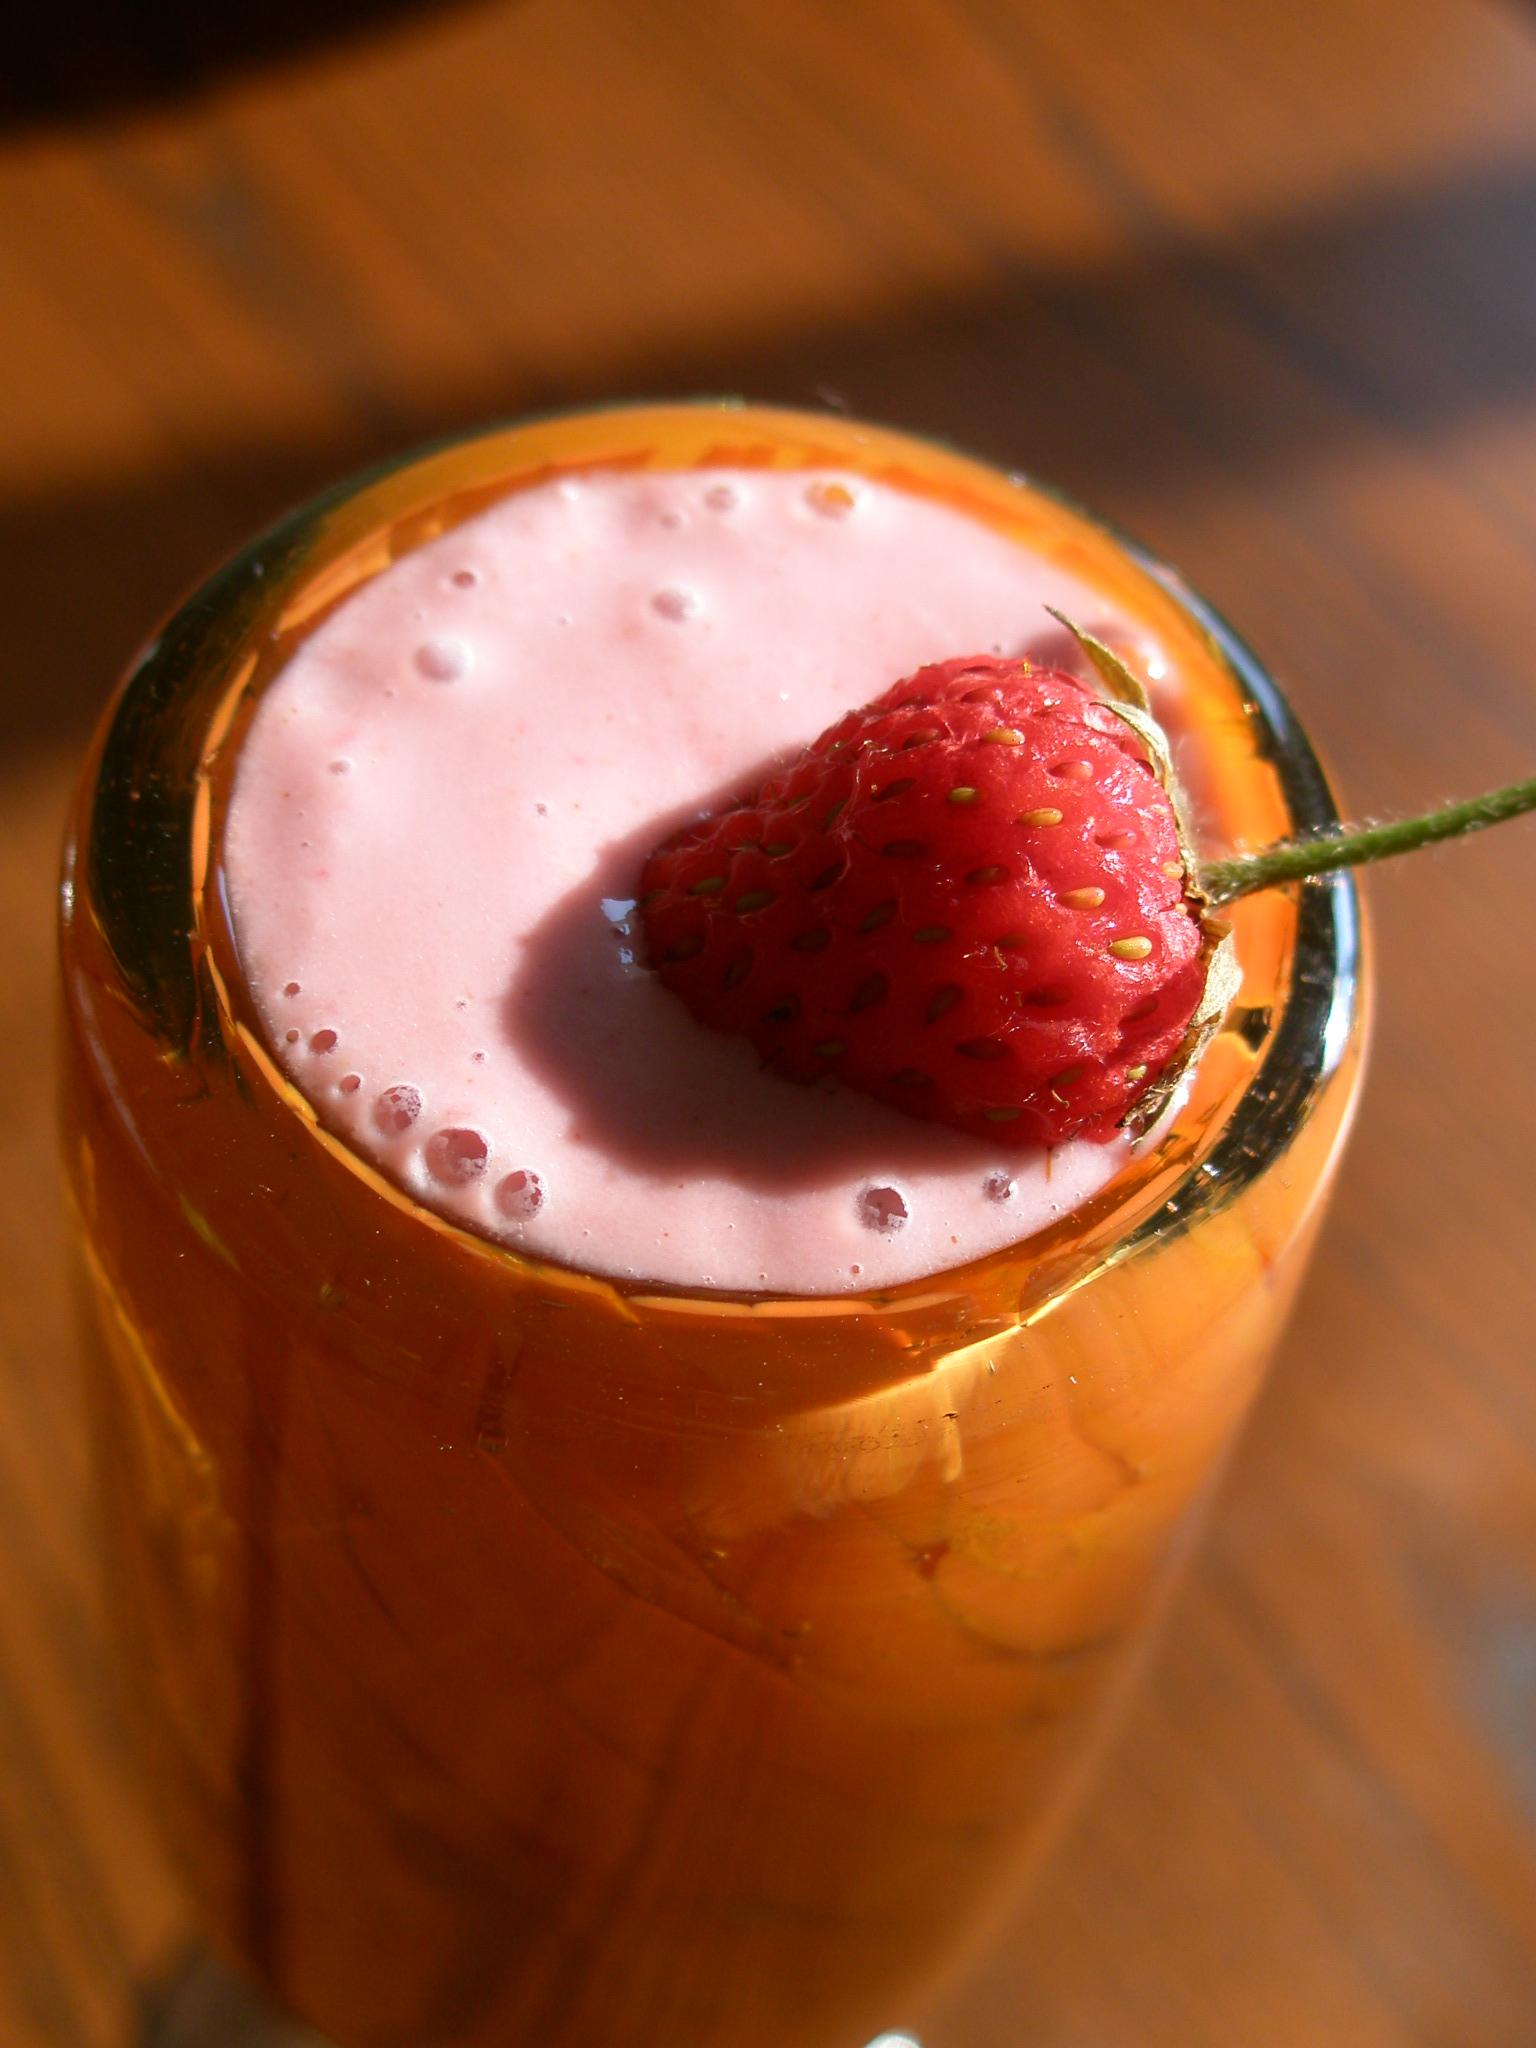 Creamy Coconut Cashew Nut Milk and a Creamy Strawberry ...